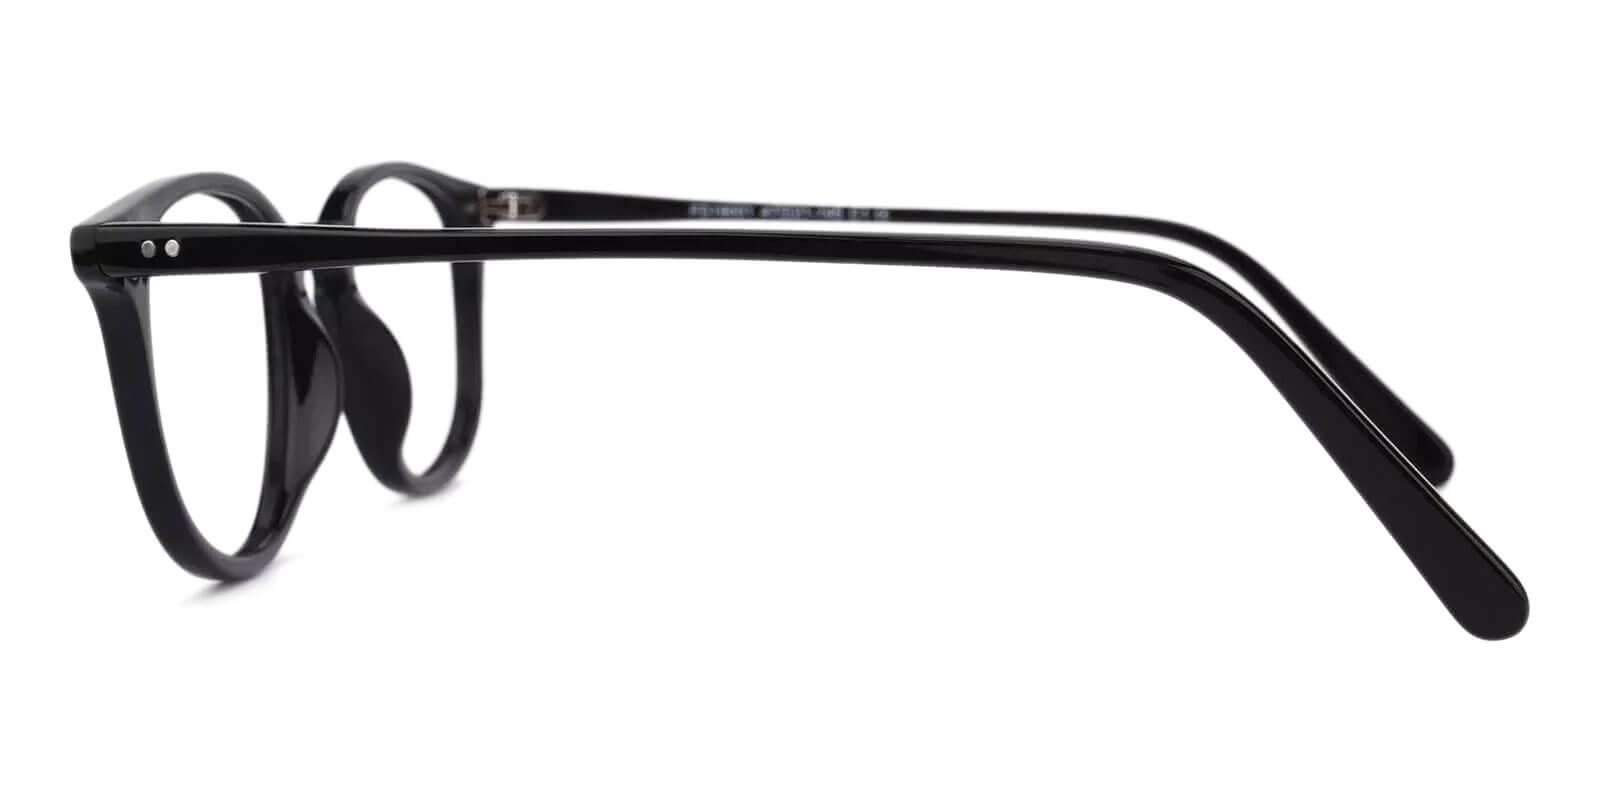 Venus Black Acetate Eyeglasses , UniversalBridgeFit Frames from ABBE Glasses